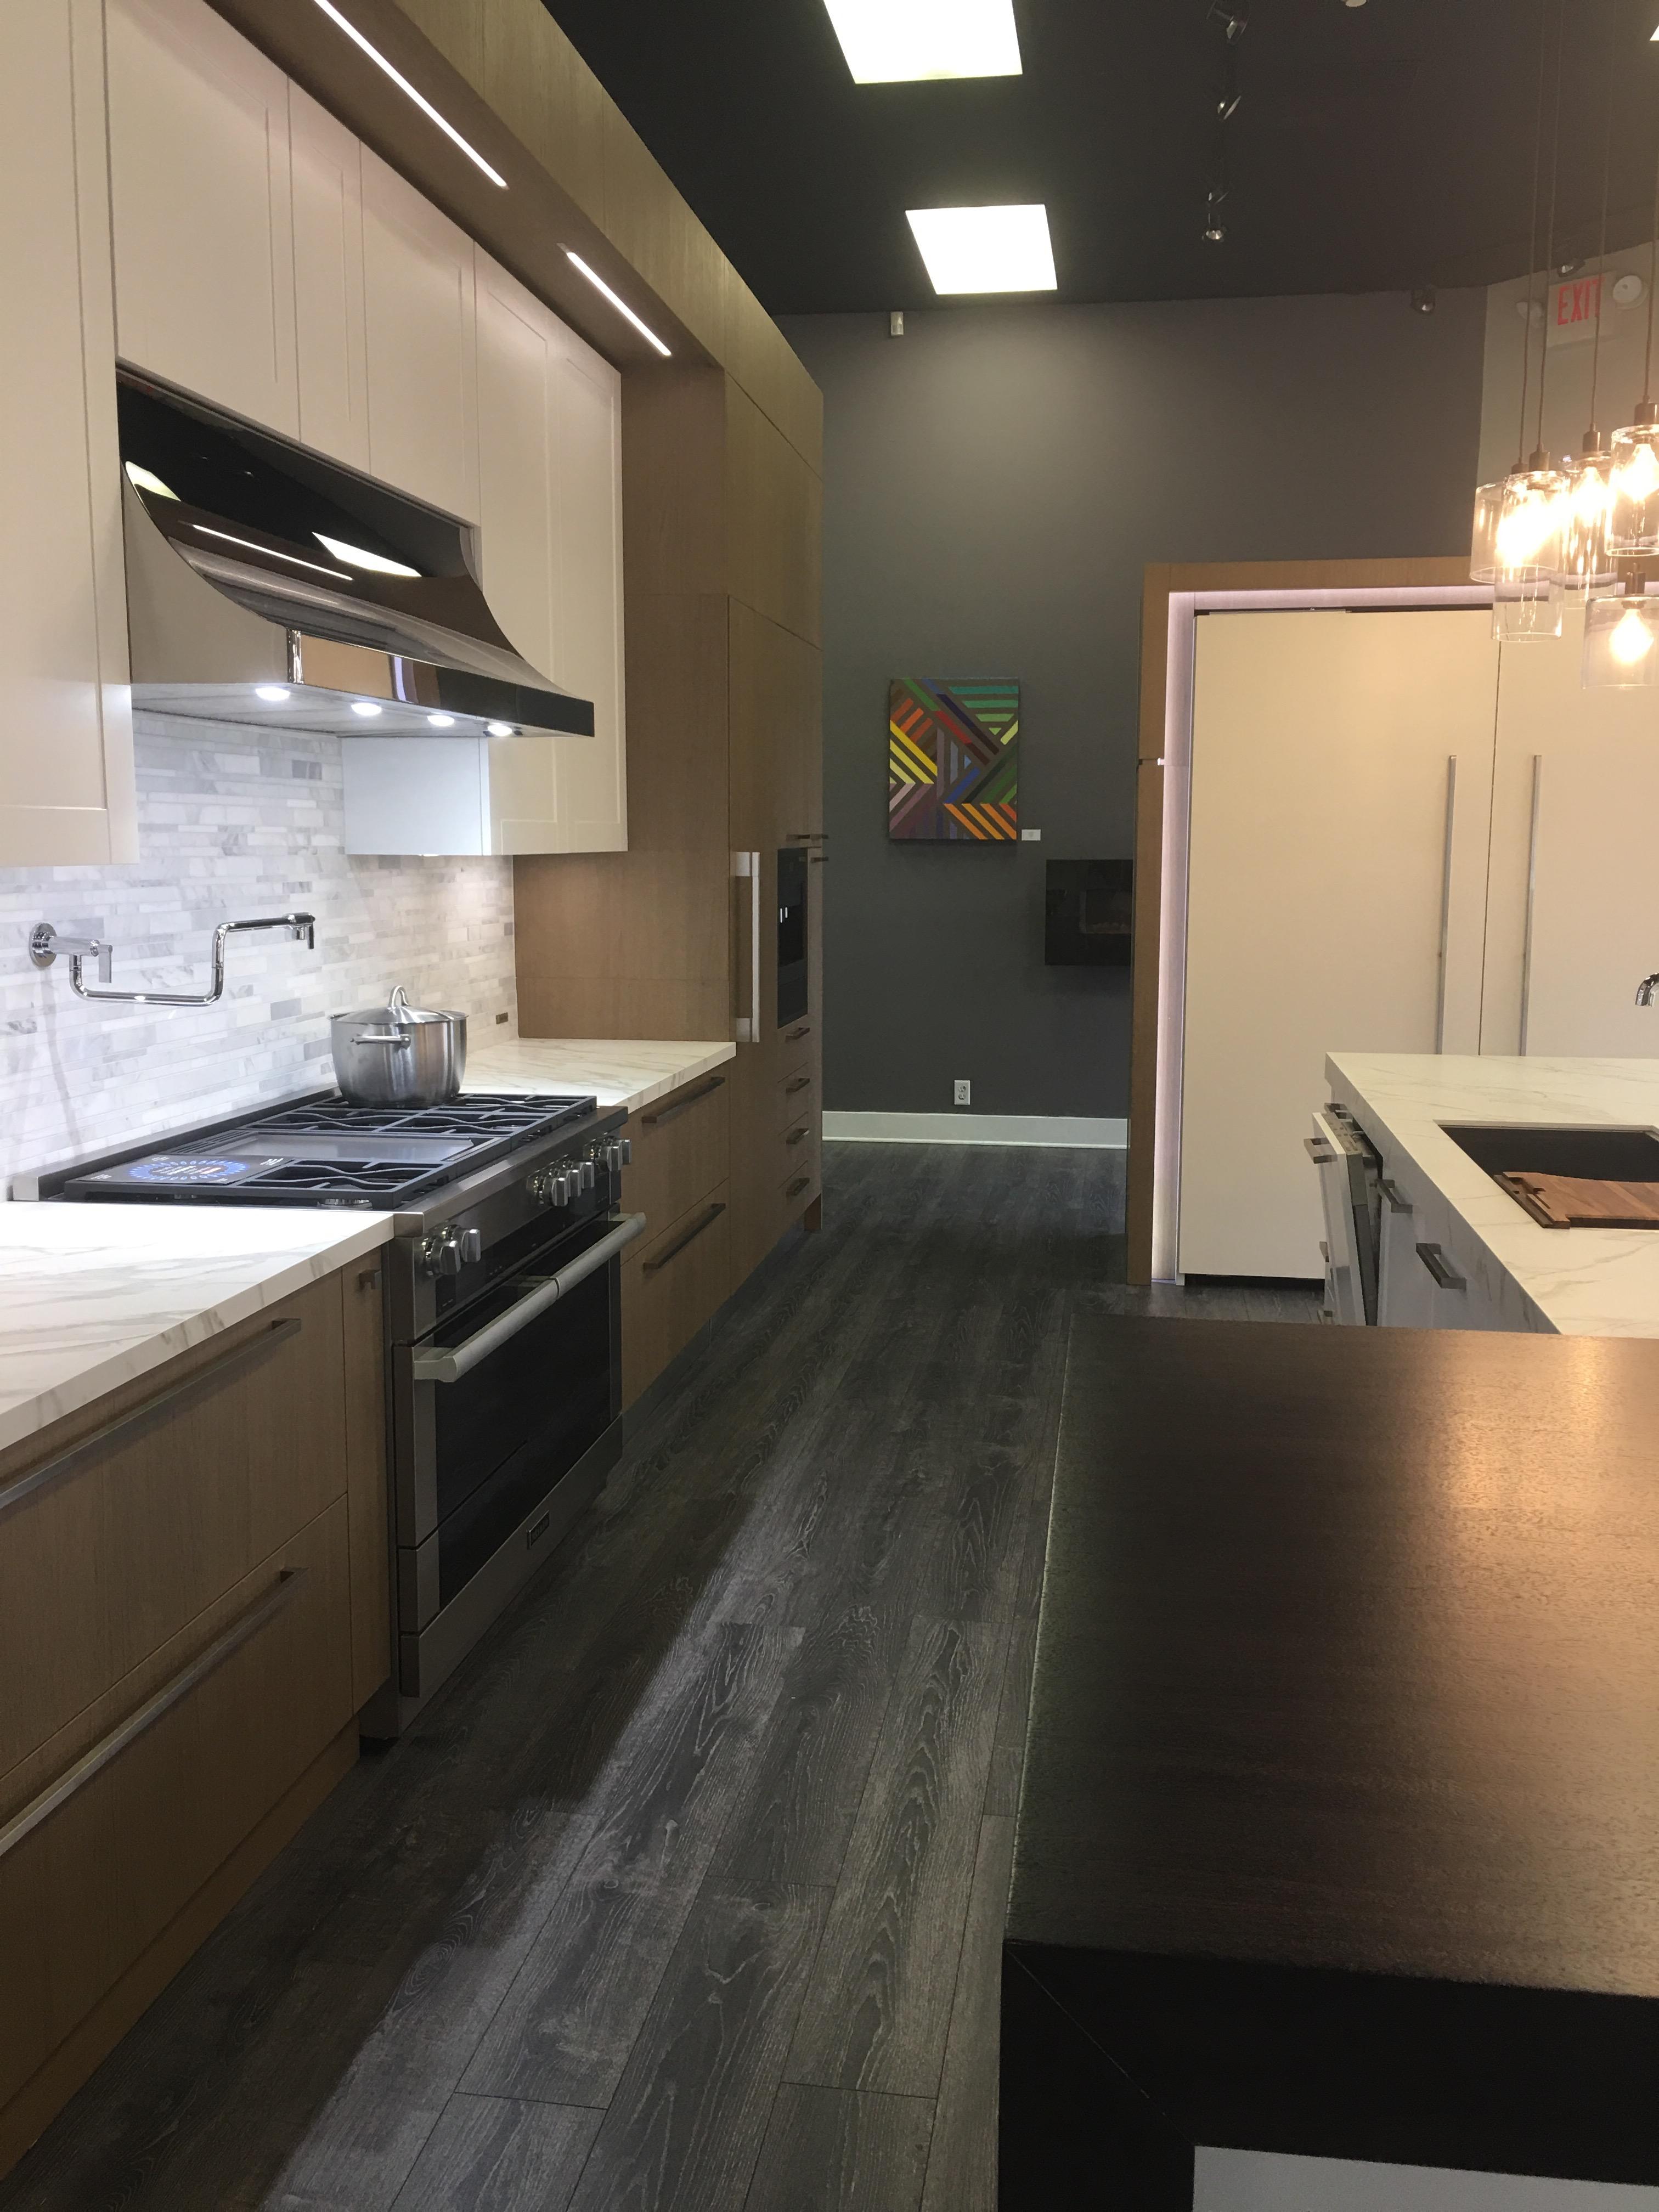 Premium Kitchens Boca Raton Wow Blog